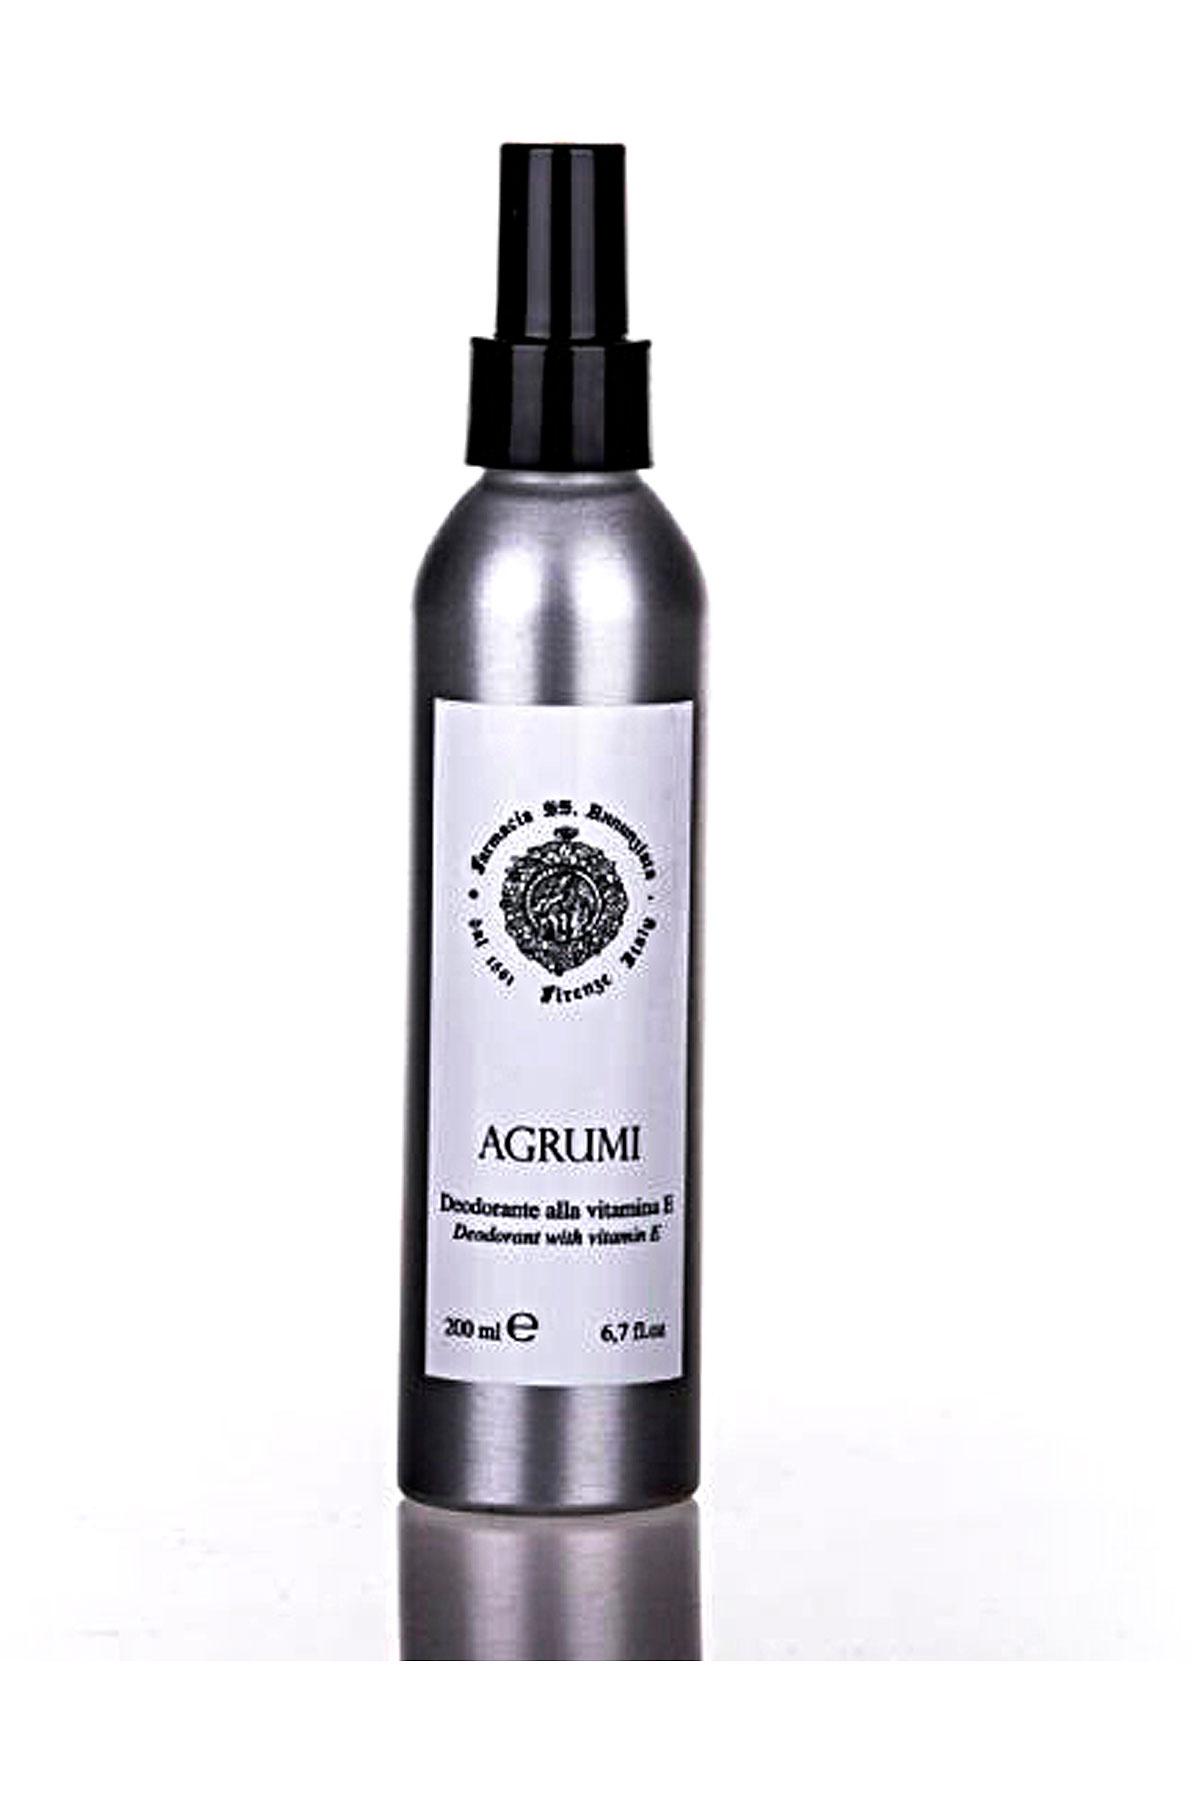 Farmacia Ss Annunziata 1561 Beauty for Men On Sale, Agrumi - Deodorant - 200 Ml, 2019, 200 ml